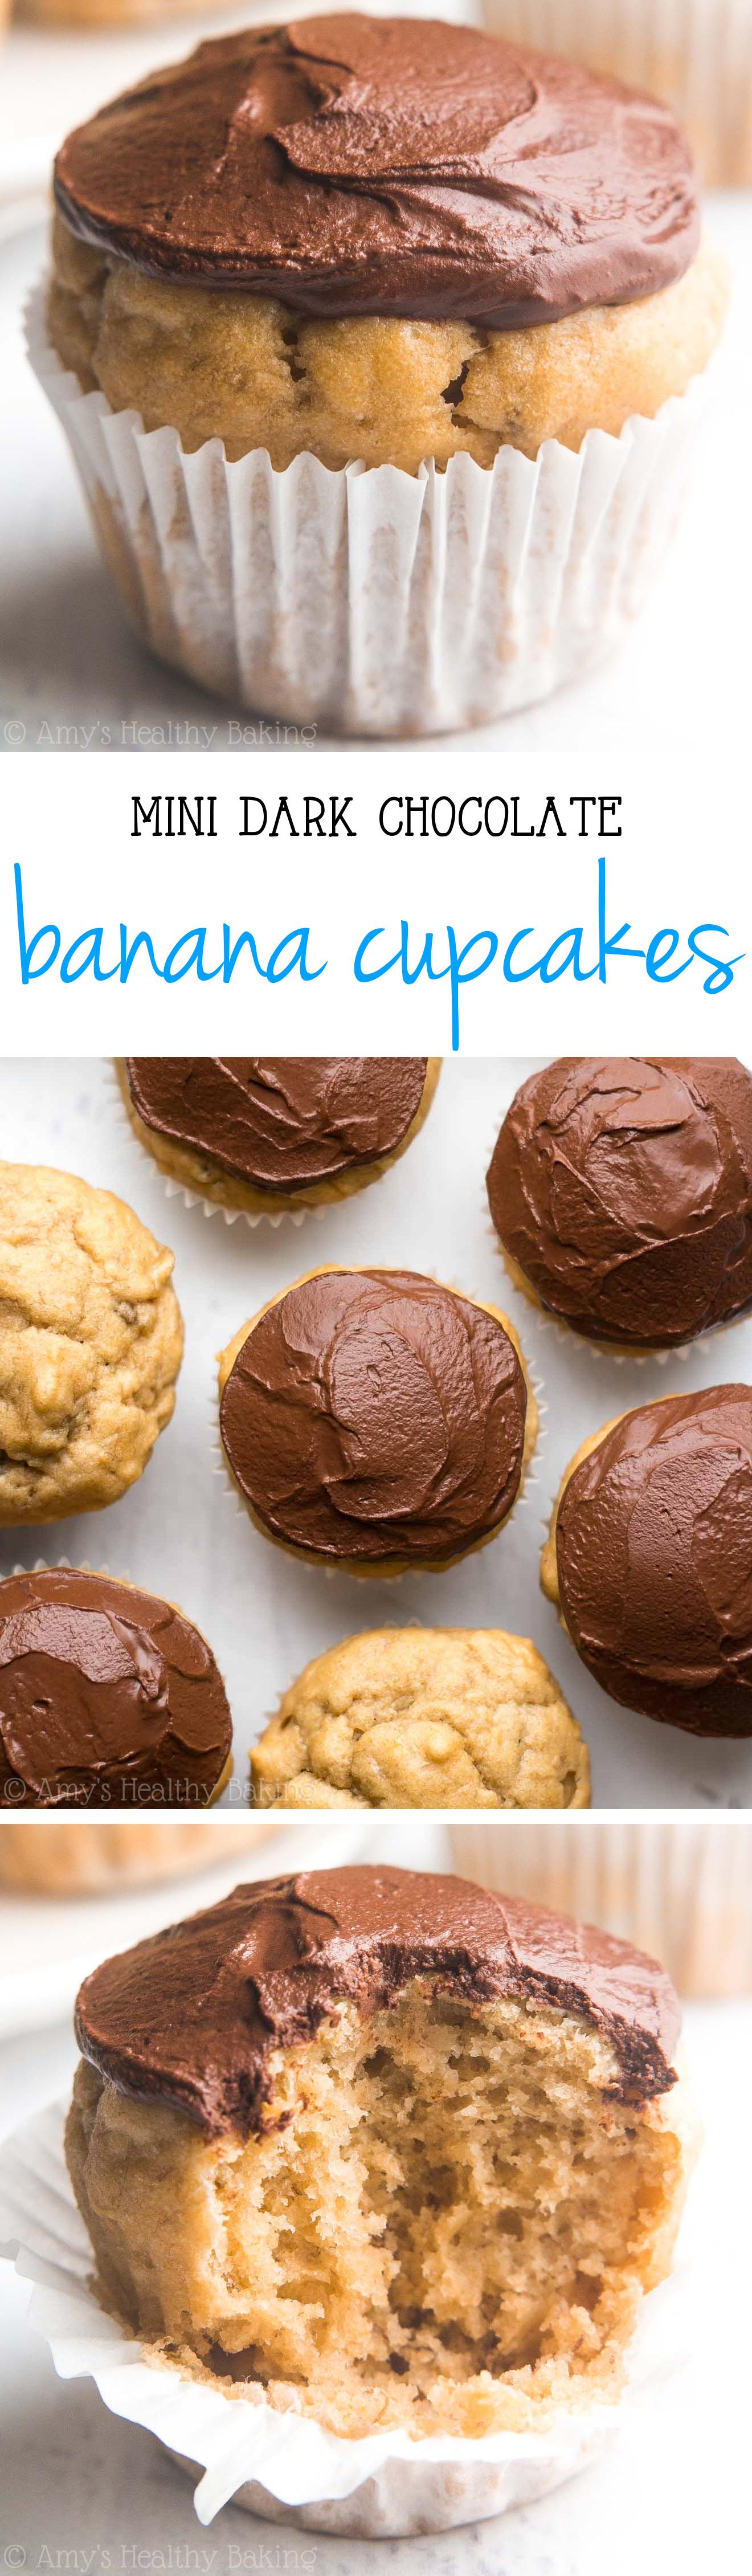 Mini Dark Chocolate Banana Cupcakes Amy S Healthy Baking